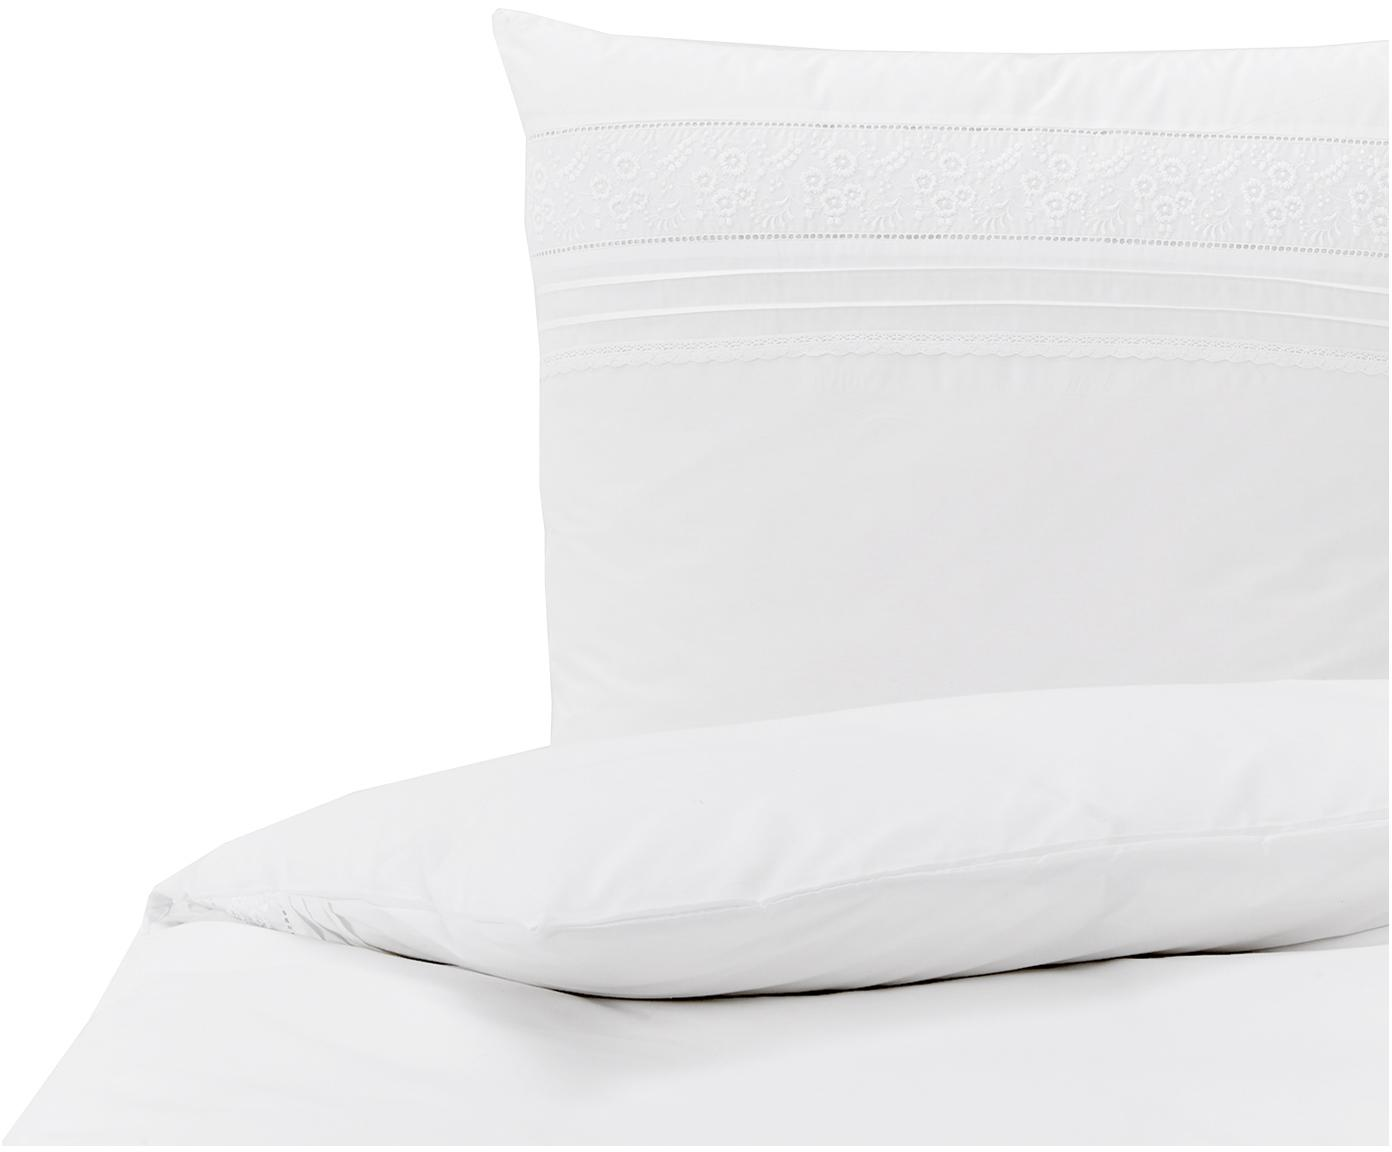 Baumwollperkal-Bettwäsche Avery in Weiß mit Stickerei, Webart: Perkal Fadendichte 200 TC, Weiß, 135 x 200 cm + 1 Kissen 80 x 80 cm